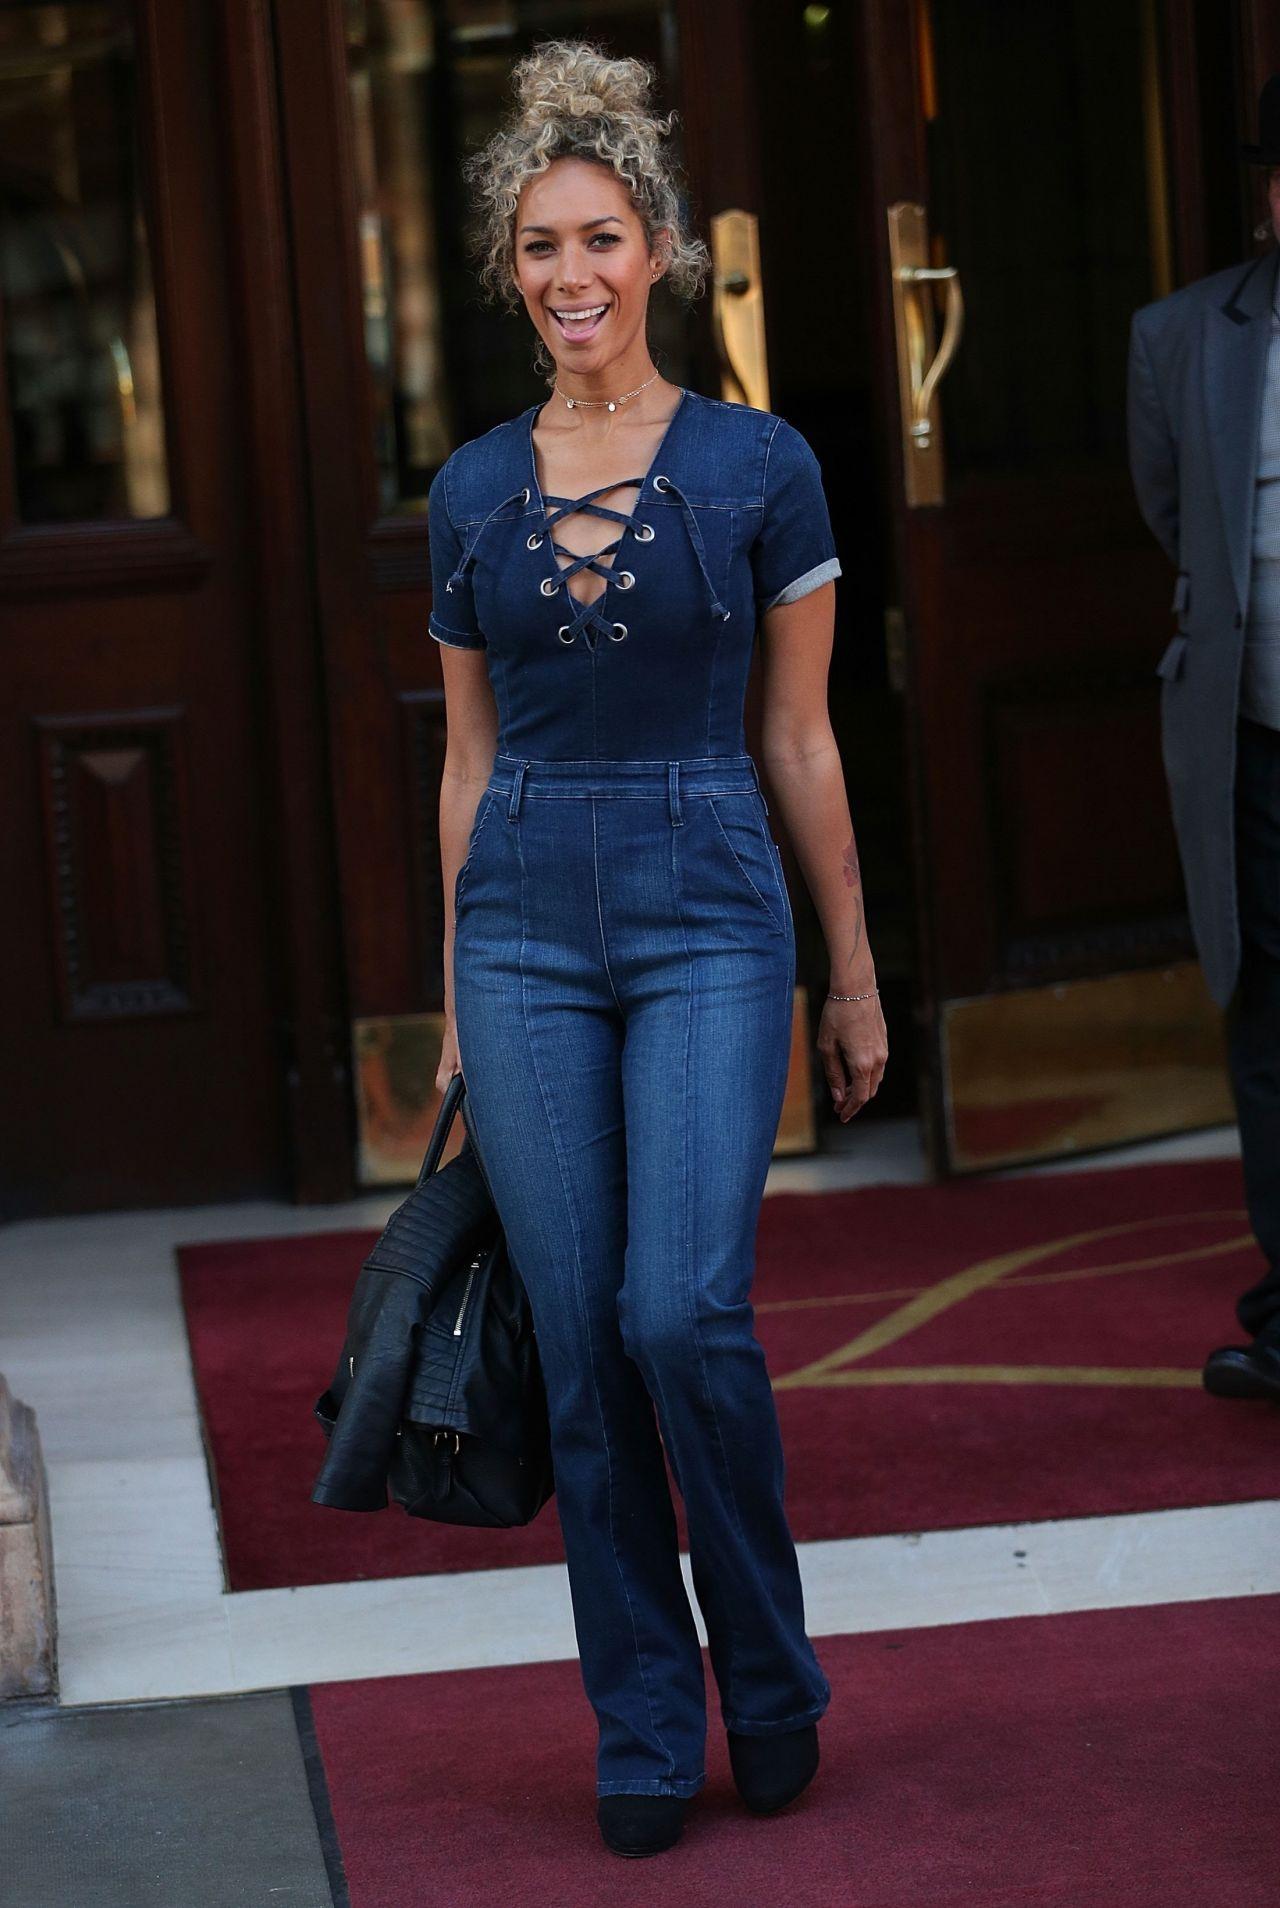 Leona Lewis In Jeans Leaving The Landmark Hotel In